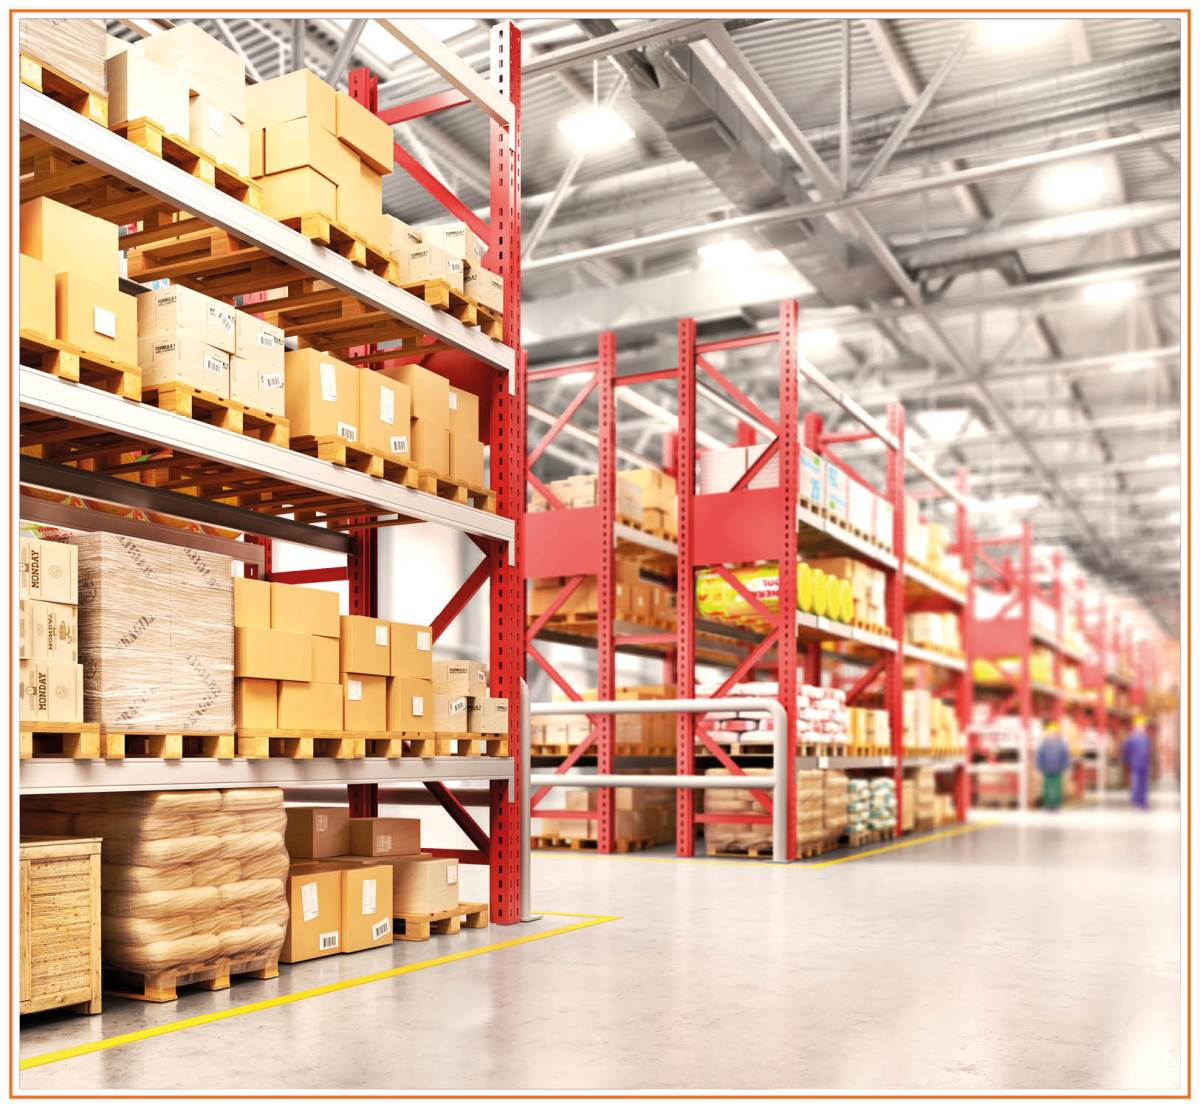 https://i1.wp.com/haultech.co.uk/wp-content/uploads/2020/04/HaulTech-Warehouse-Management-System-Helping-Hauliers-Demand.jpg?fit=1200%2C1108&ssl=1